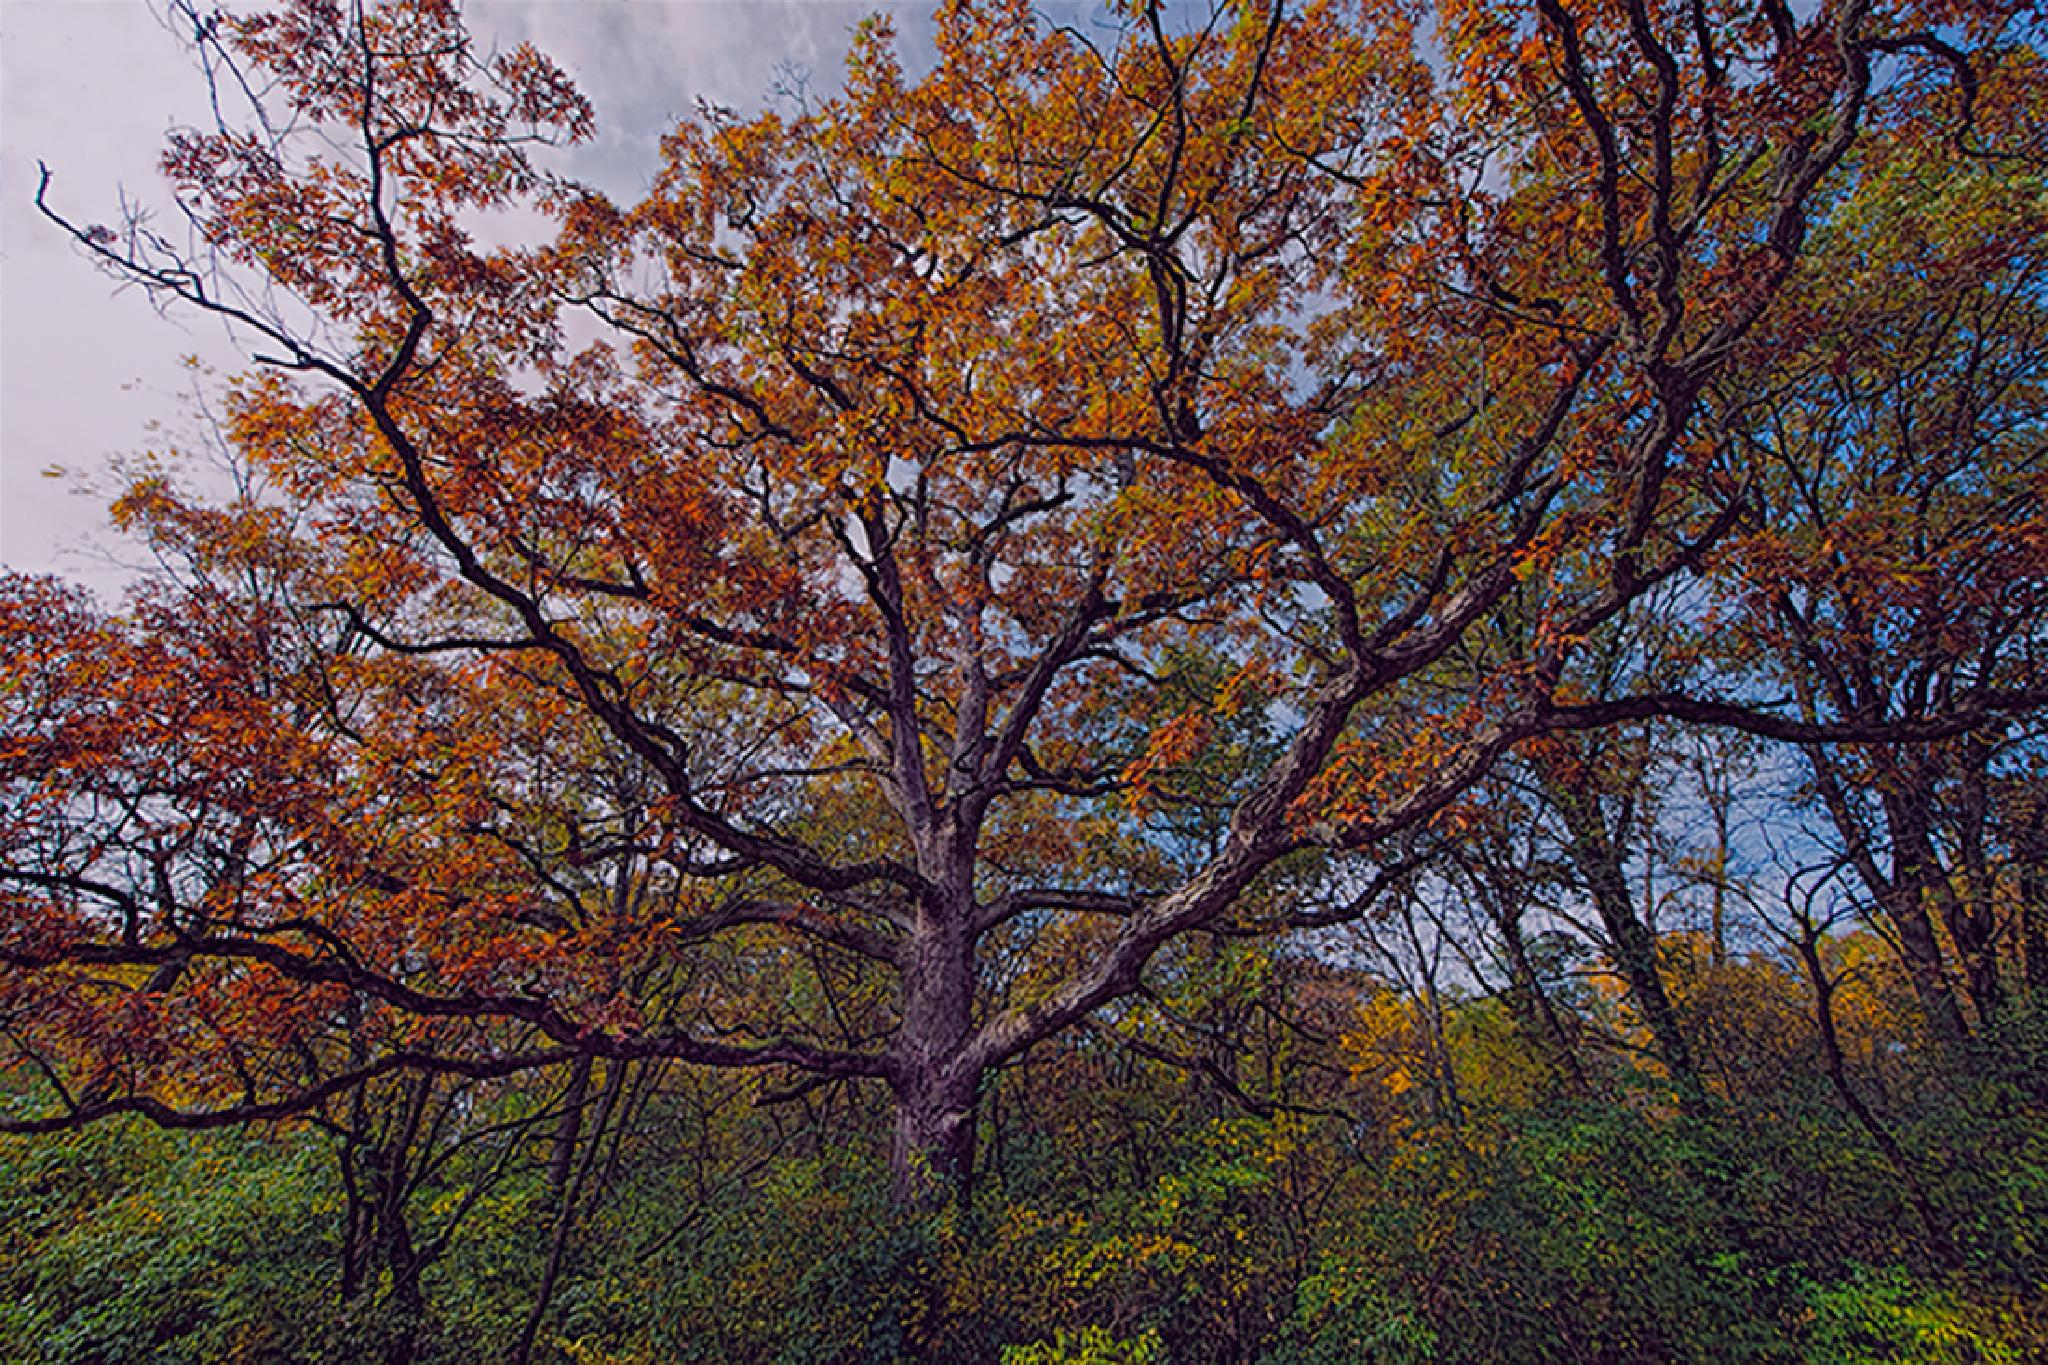 The Mighty Oak by David Neesley